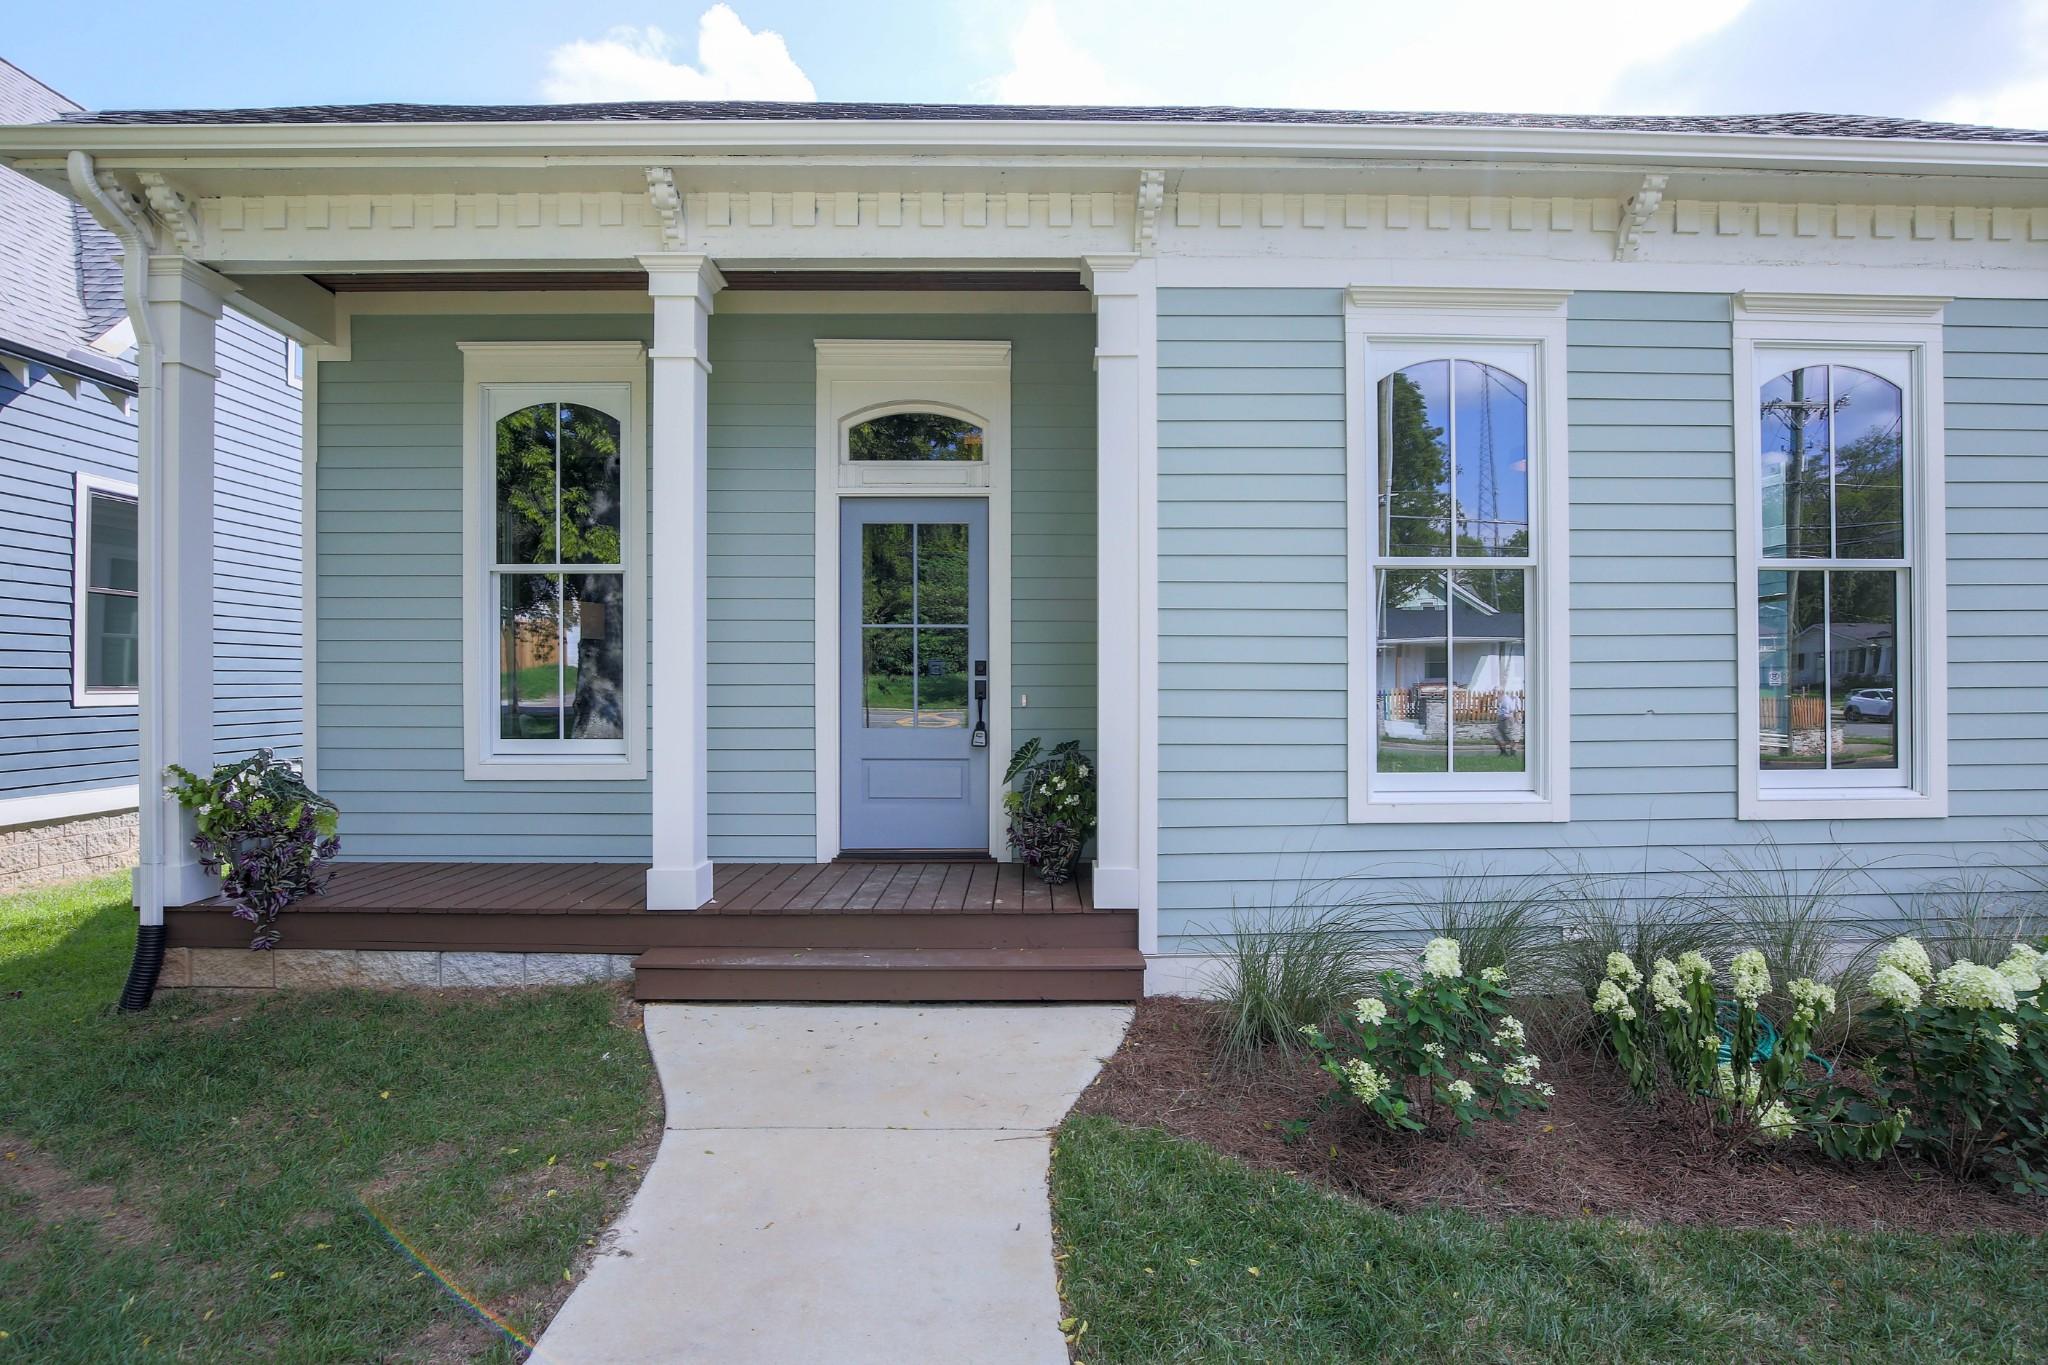 2020 10th Ave S Property Photo - Nashville, TN real estate listing